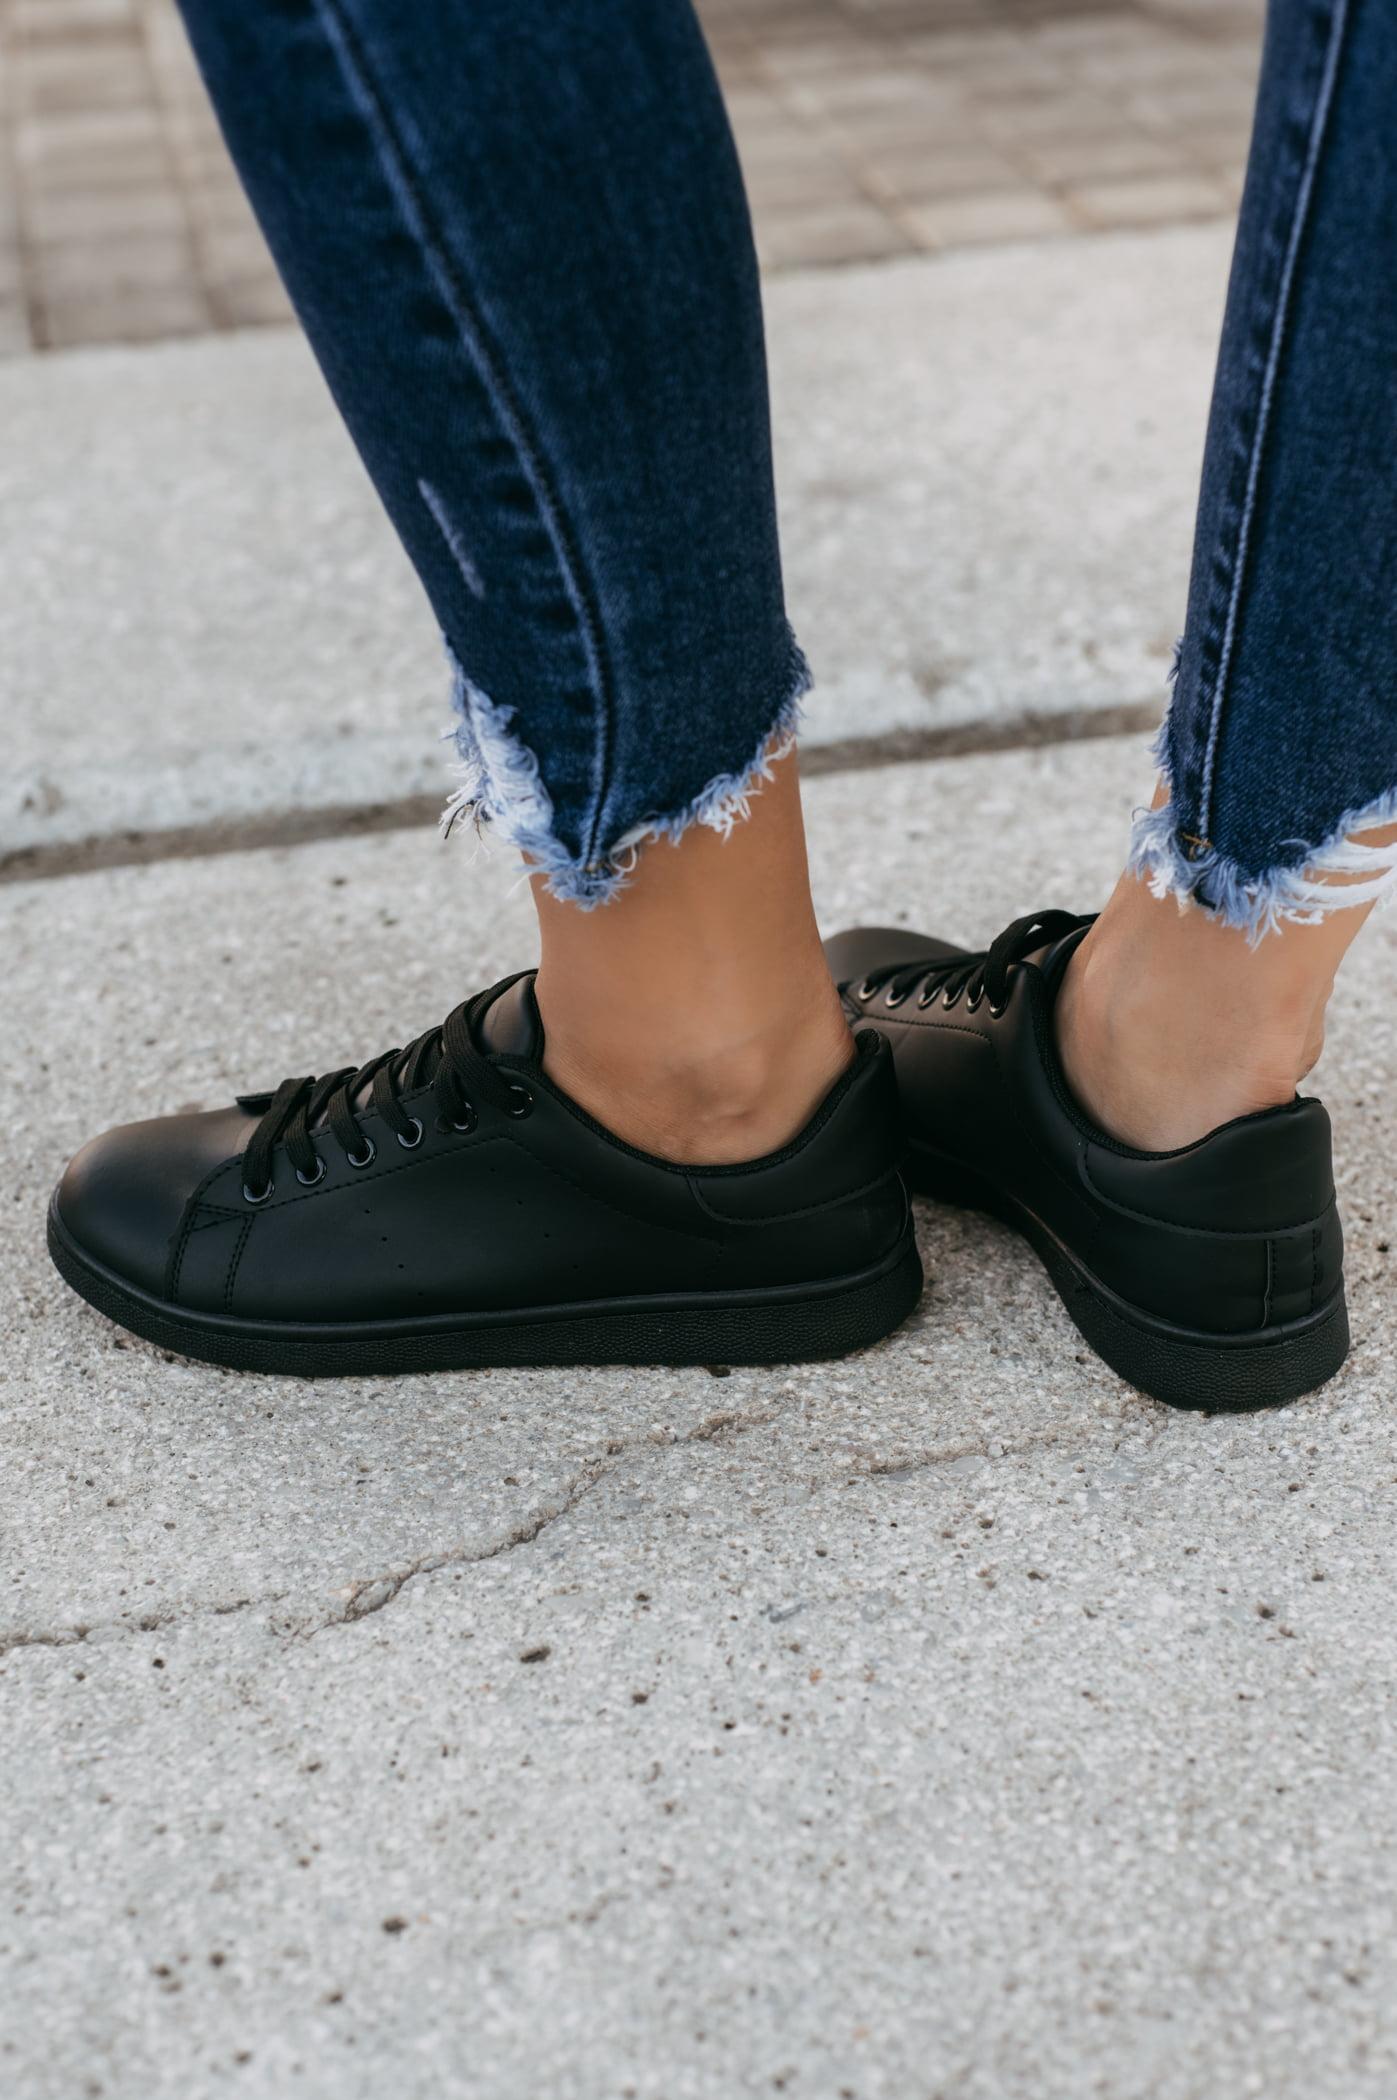 antithesis-clothing-sneakers-basic-mavra (3)